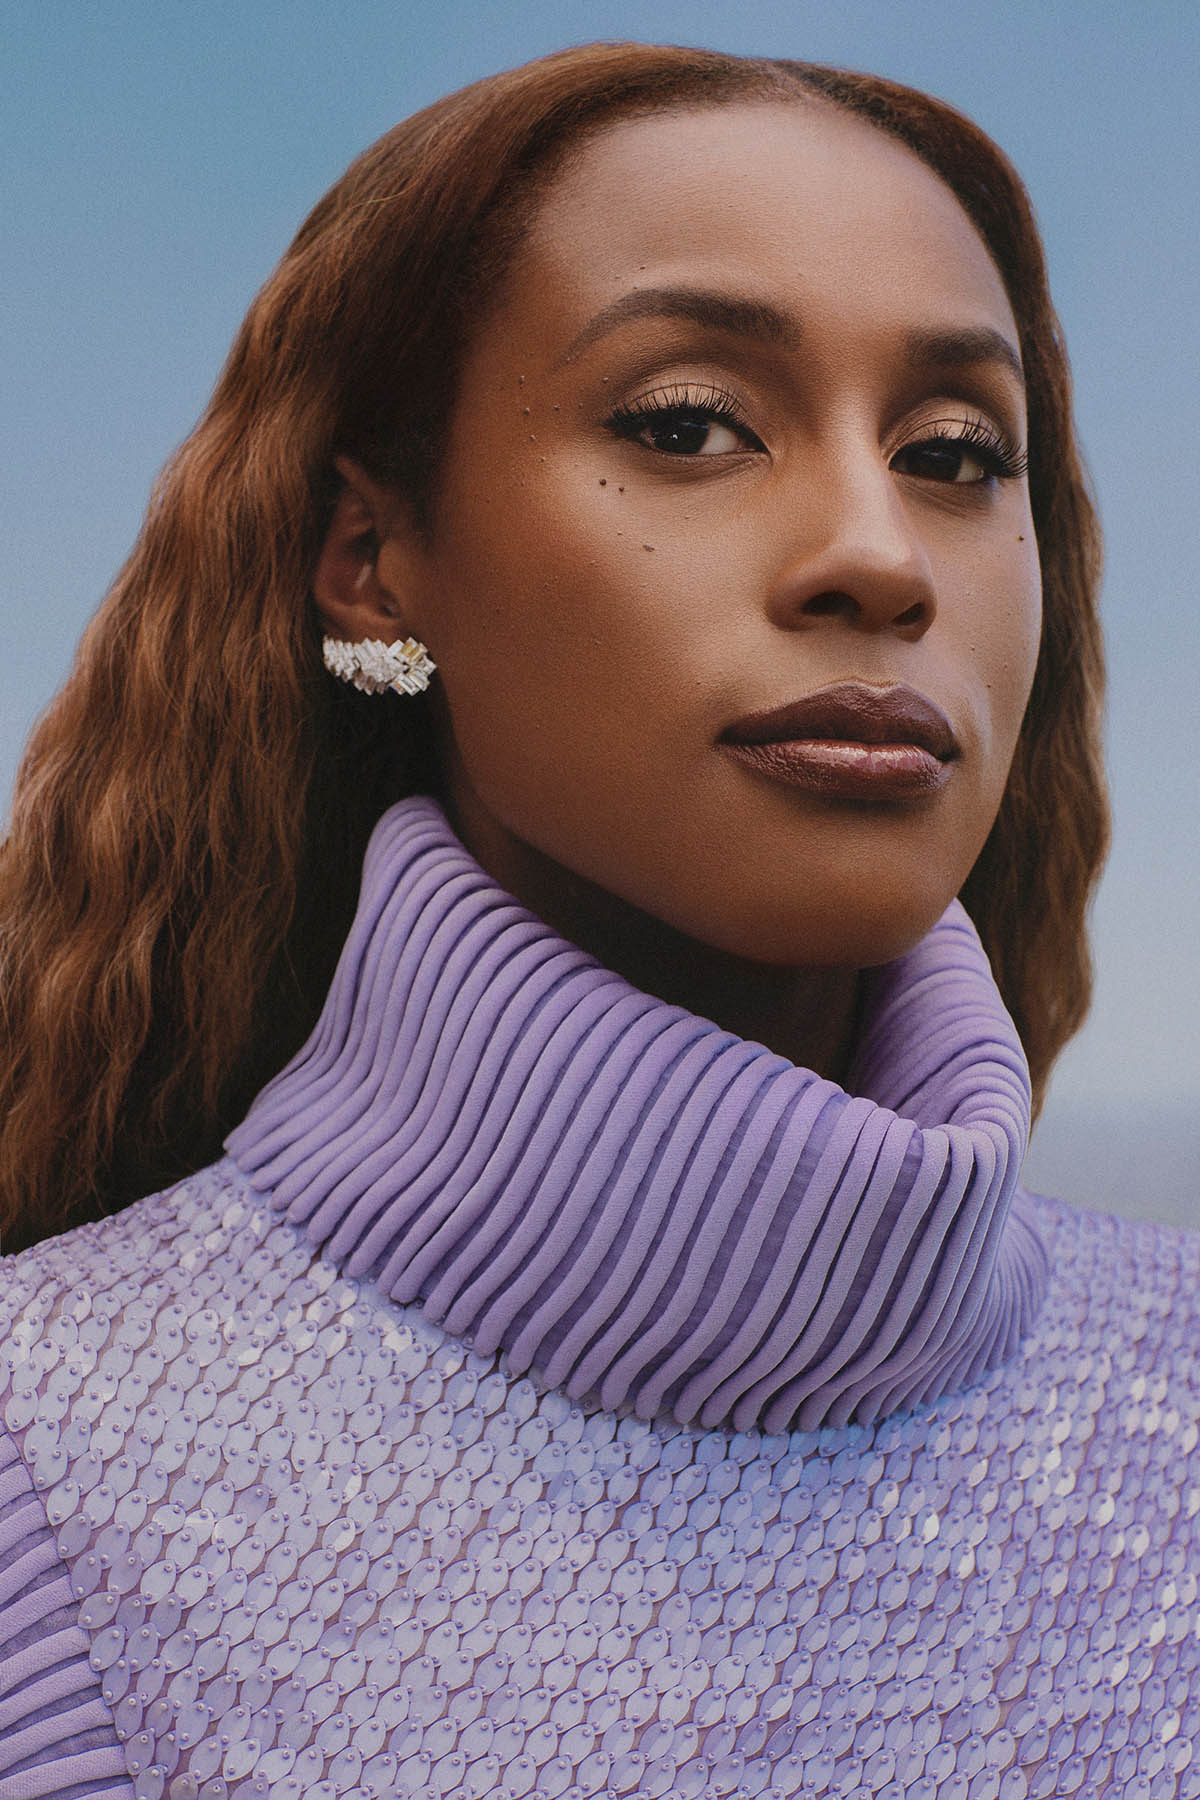 Issa Rae covers Vanity Fair June 2021 by Adrienne Raquel